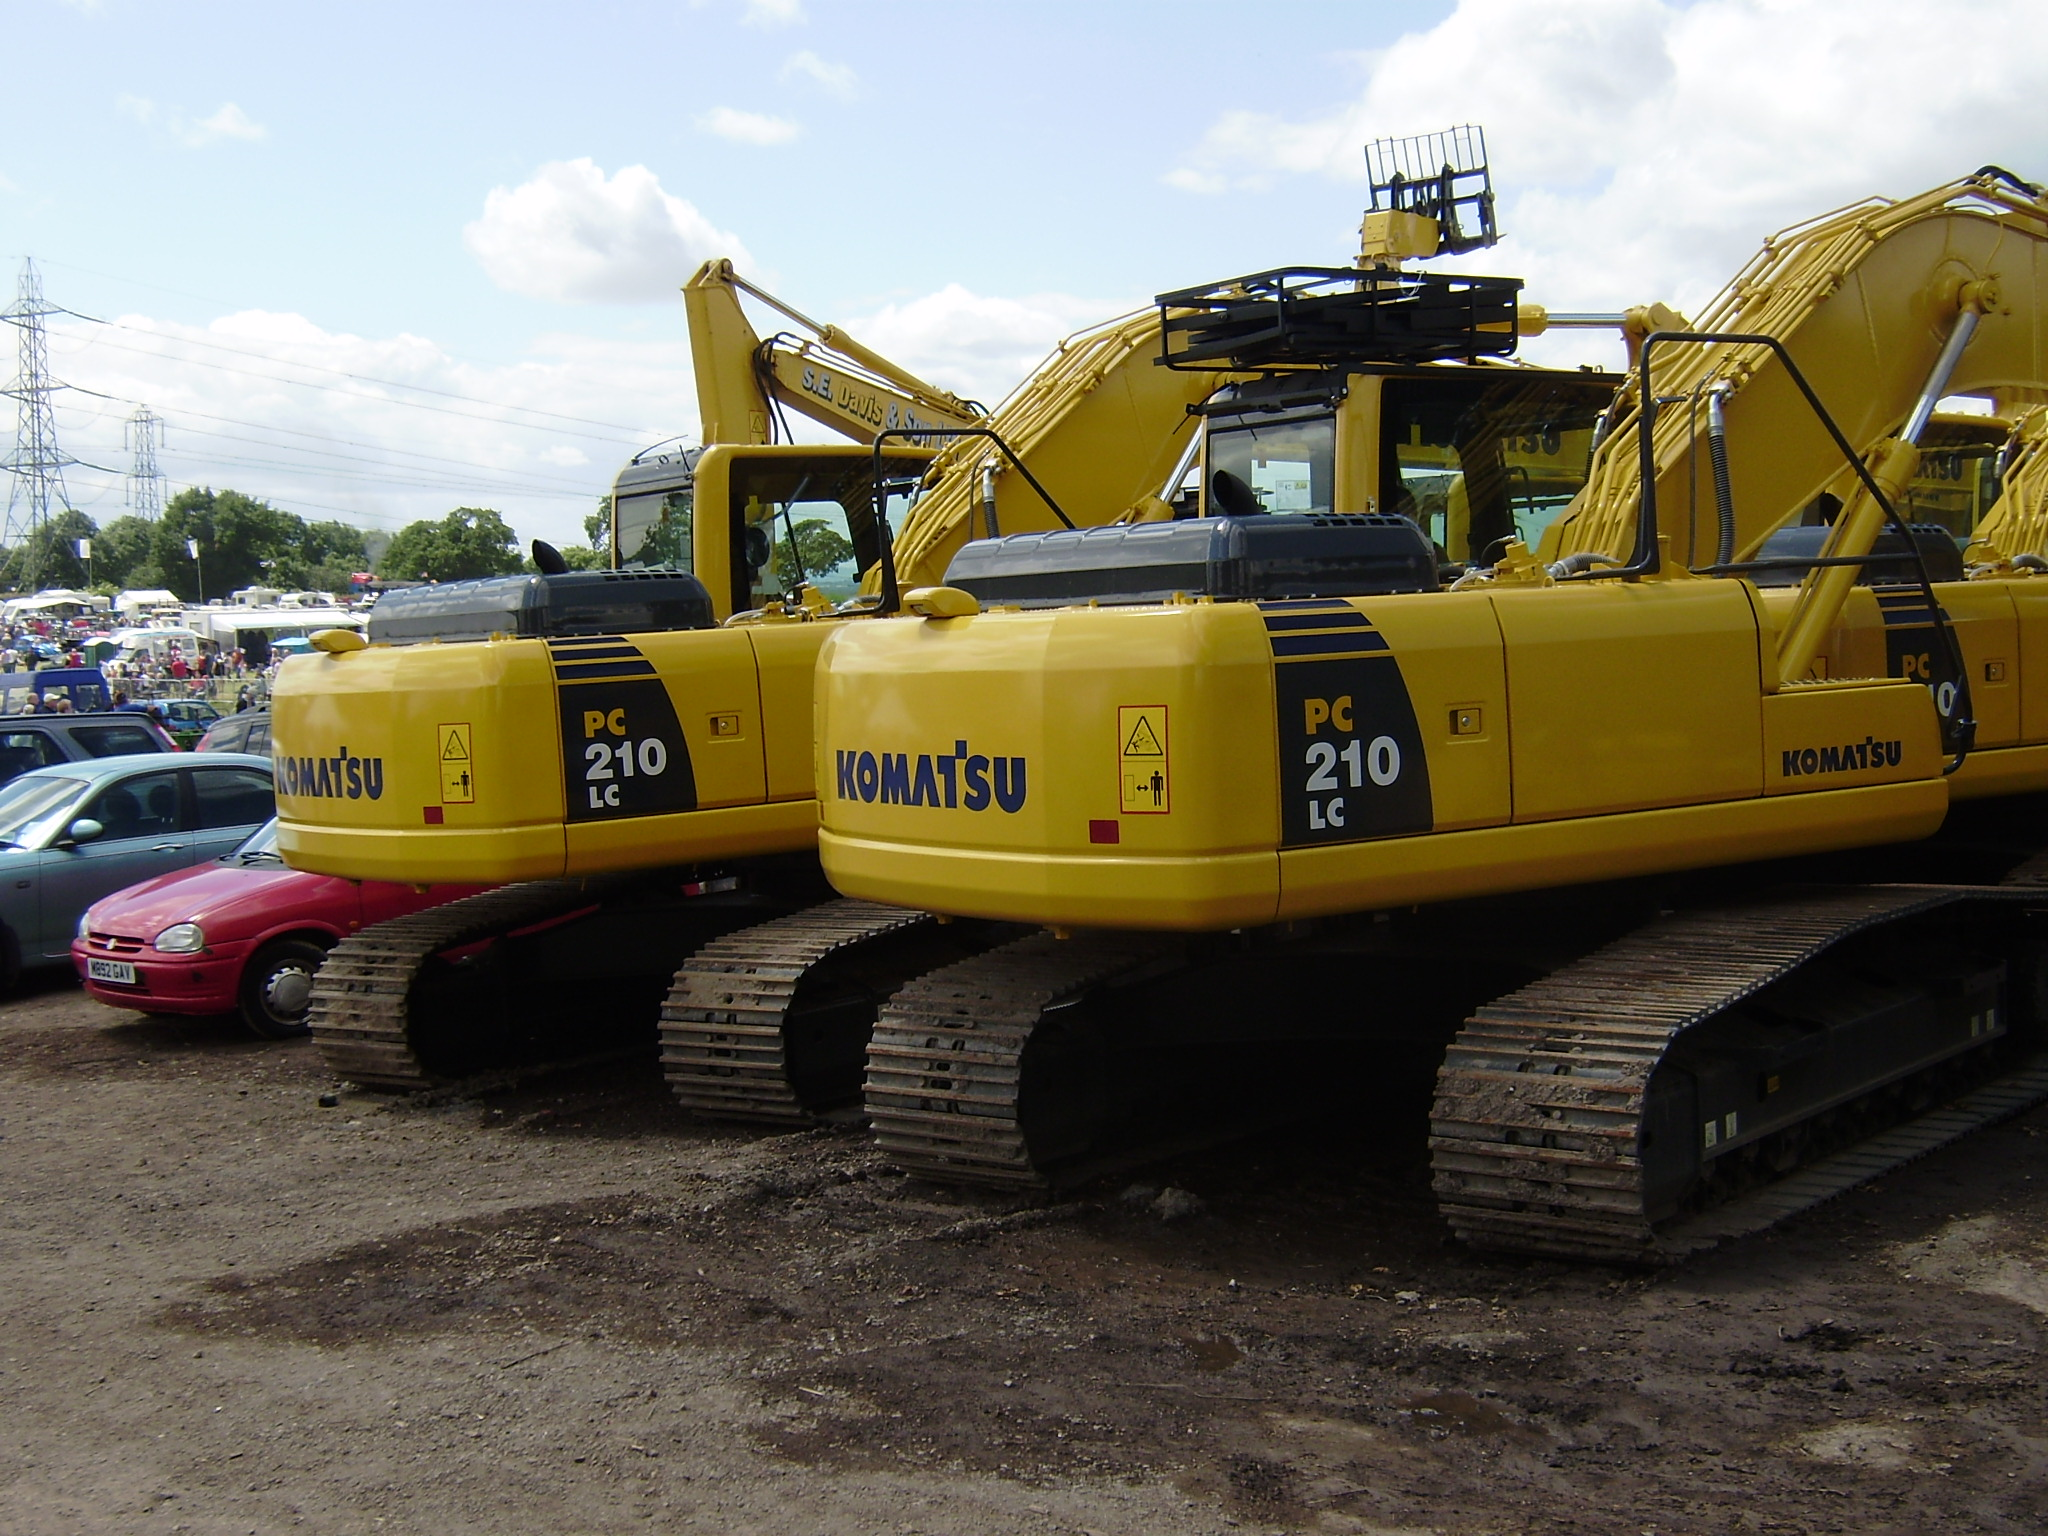 komatsu tractor construction plant wiki fandom powered by wikia komatsu pc130 p6150180 middot komatsu pc210 p6150181